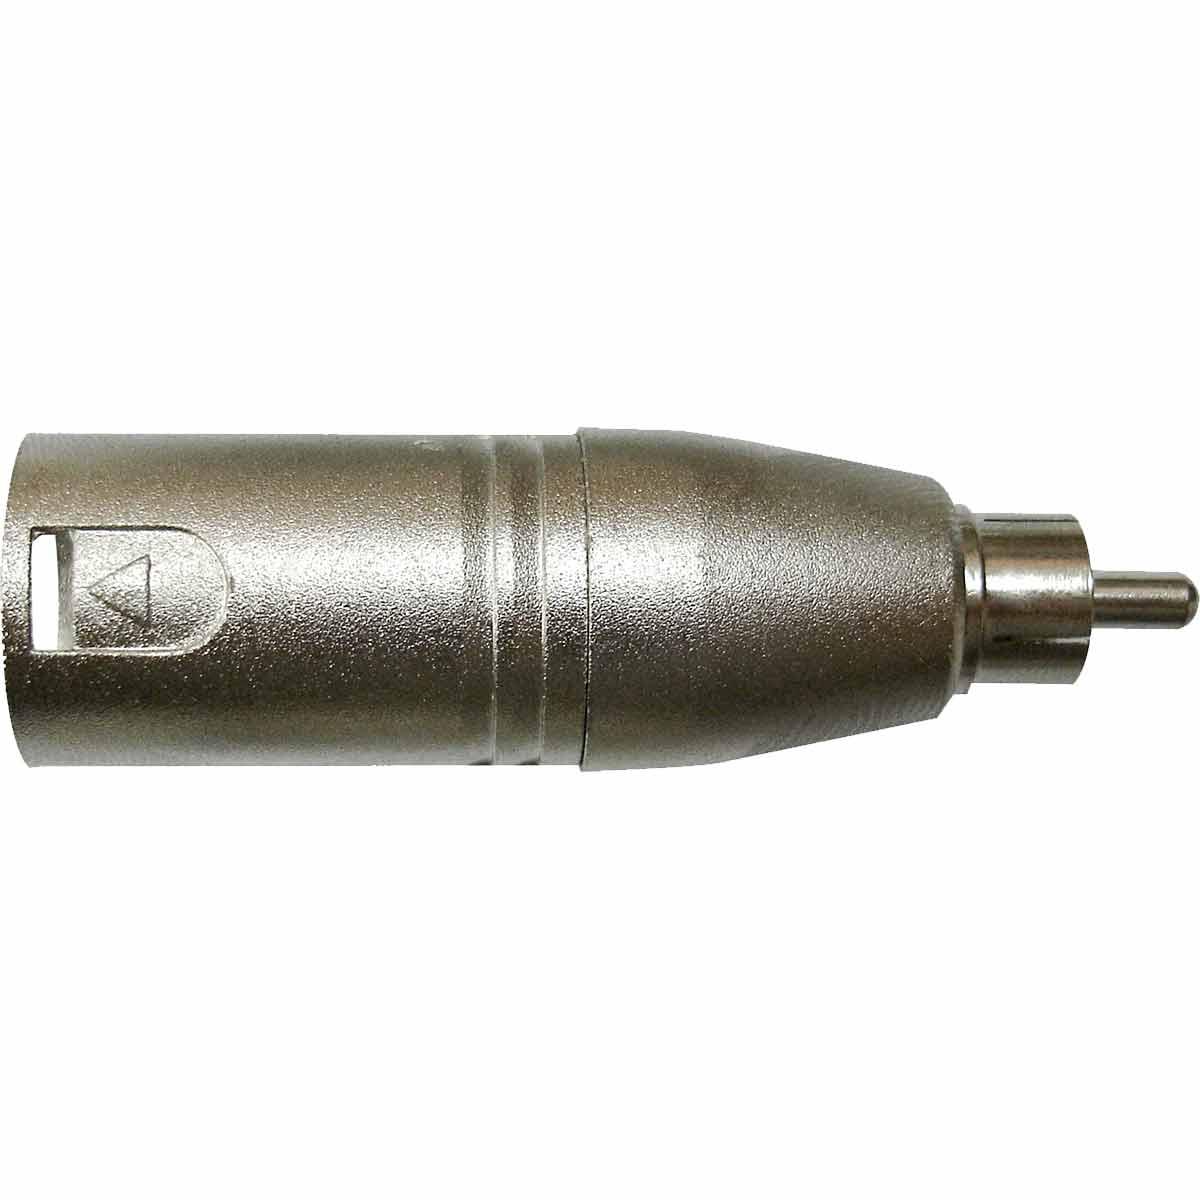 WC243AD - Adaptador XLR M / RCA M WC 243 AD - Wireconex